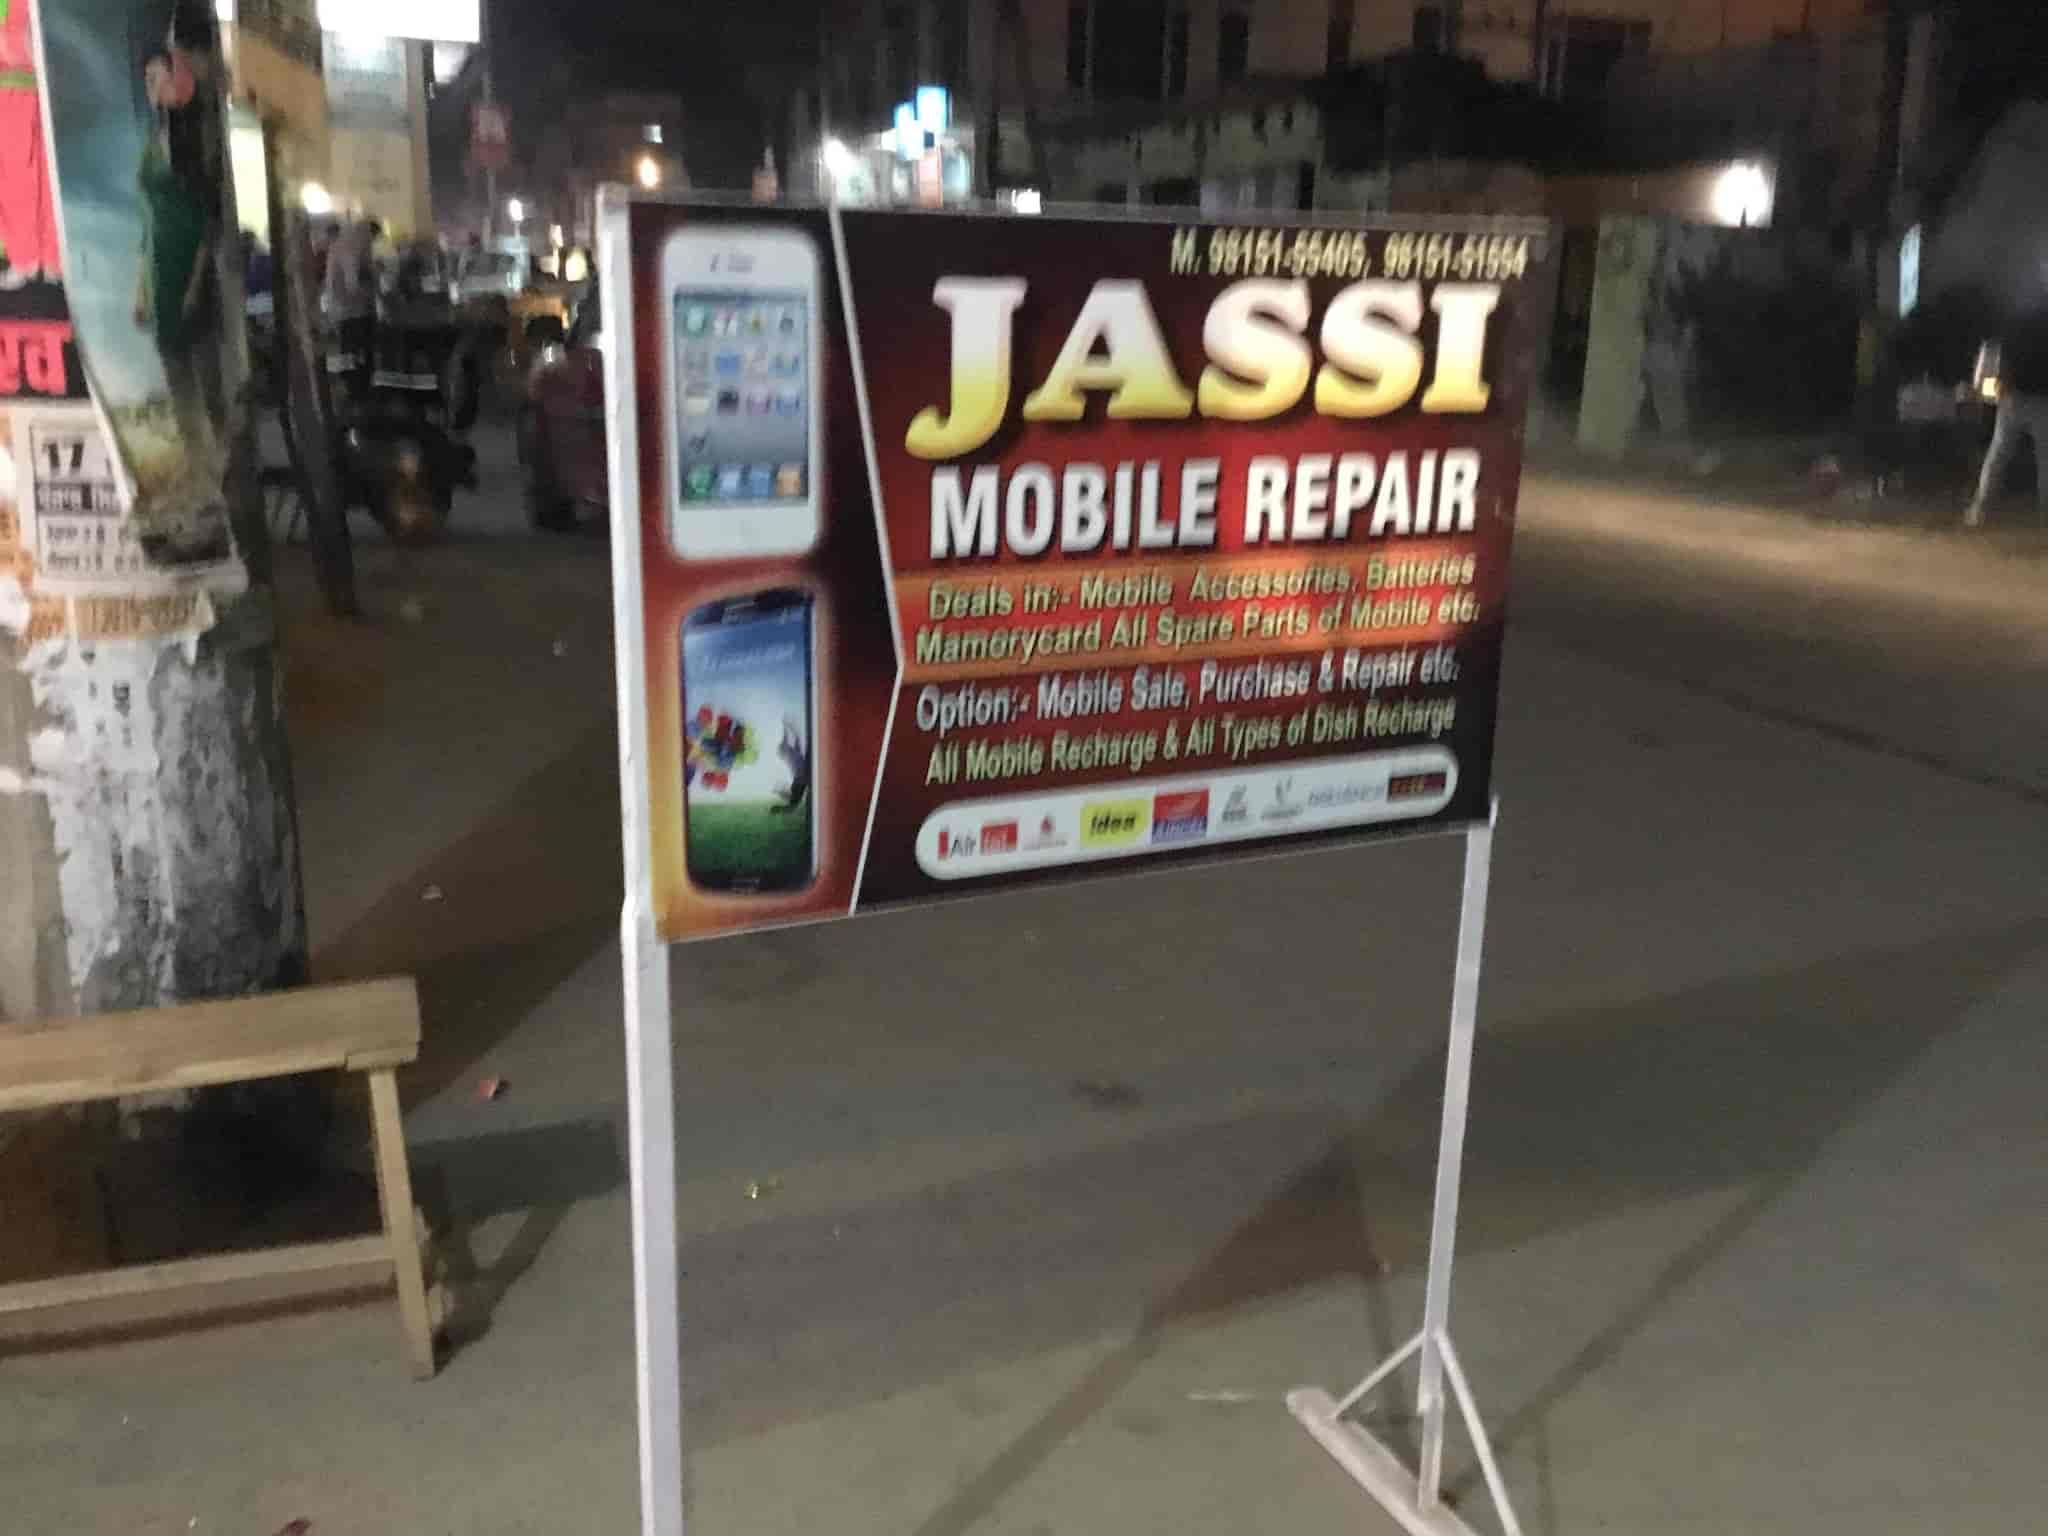 Jassi Mobile Repair Photos, Kharar, Chandigarh- Pictures & Images